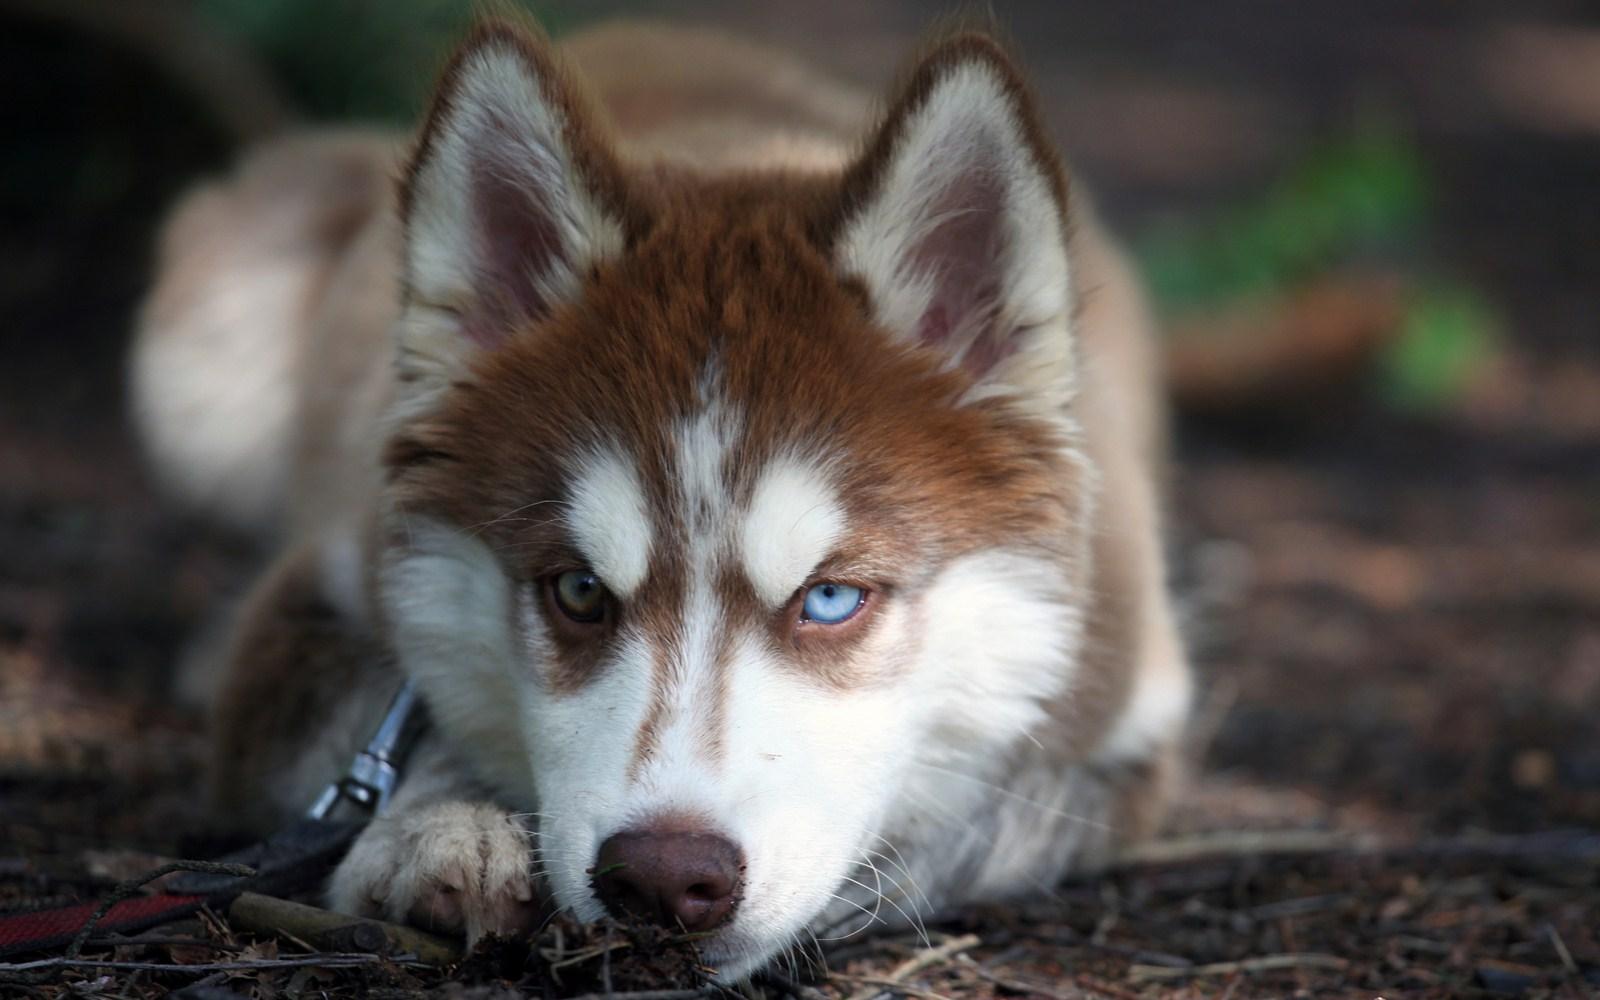 http://1.bp.blogspot.com/-eVLBaQ6_3ag/TnPJPPFhPHI/AAAAAAAAAbs/g23f93ig-Gw/s1600/Husky+Dog+-+PremiumWallpapersHD.Blogspot.Com.jpg